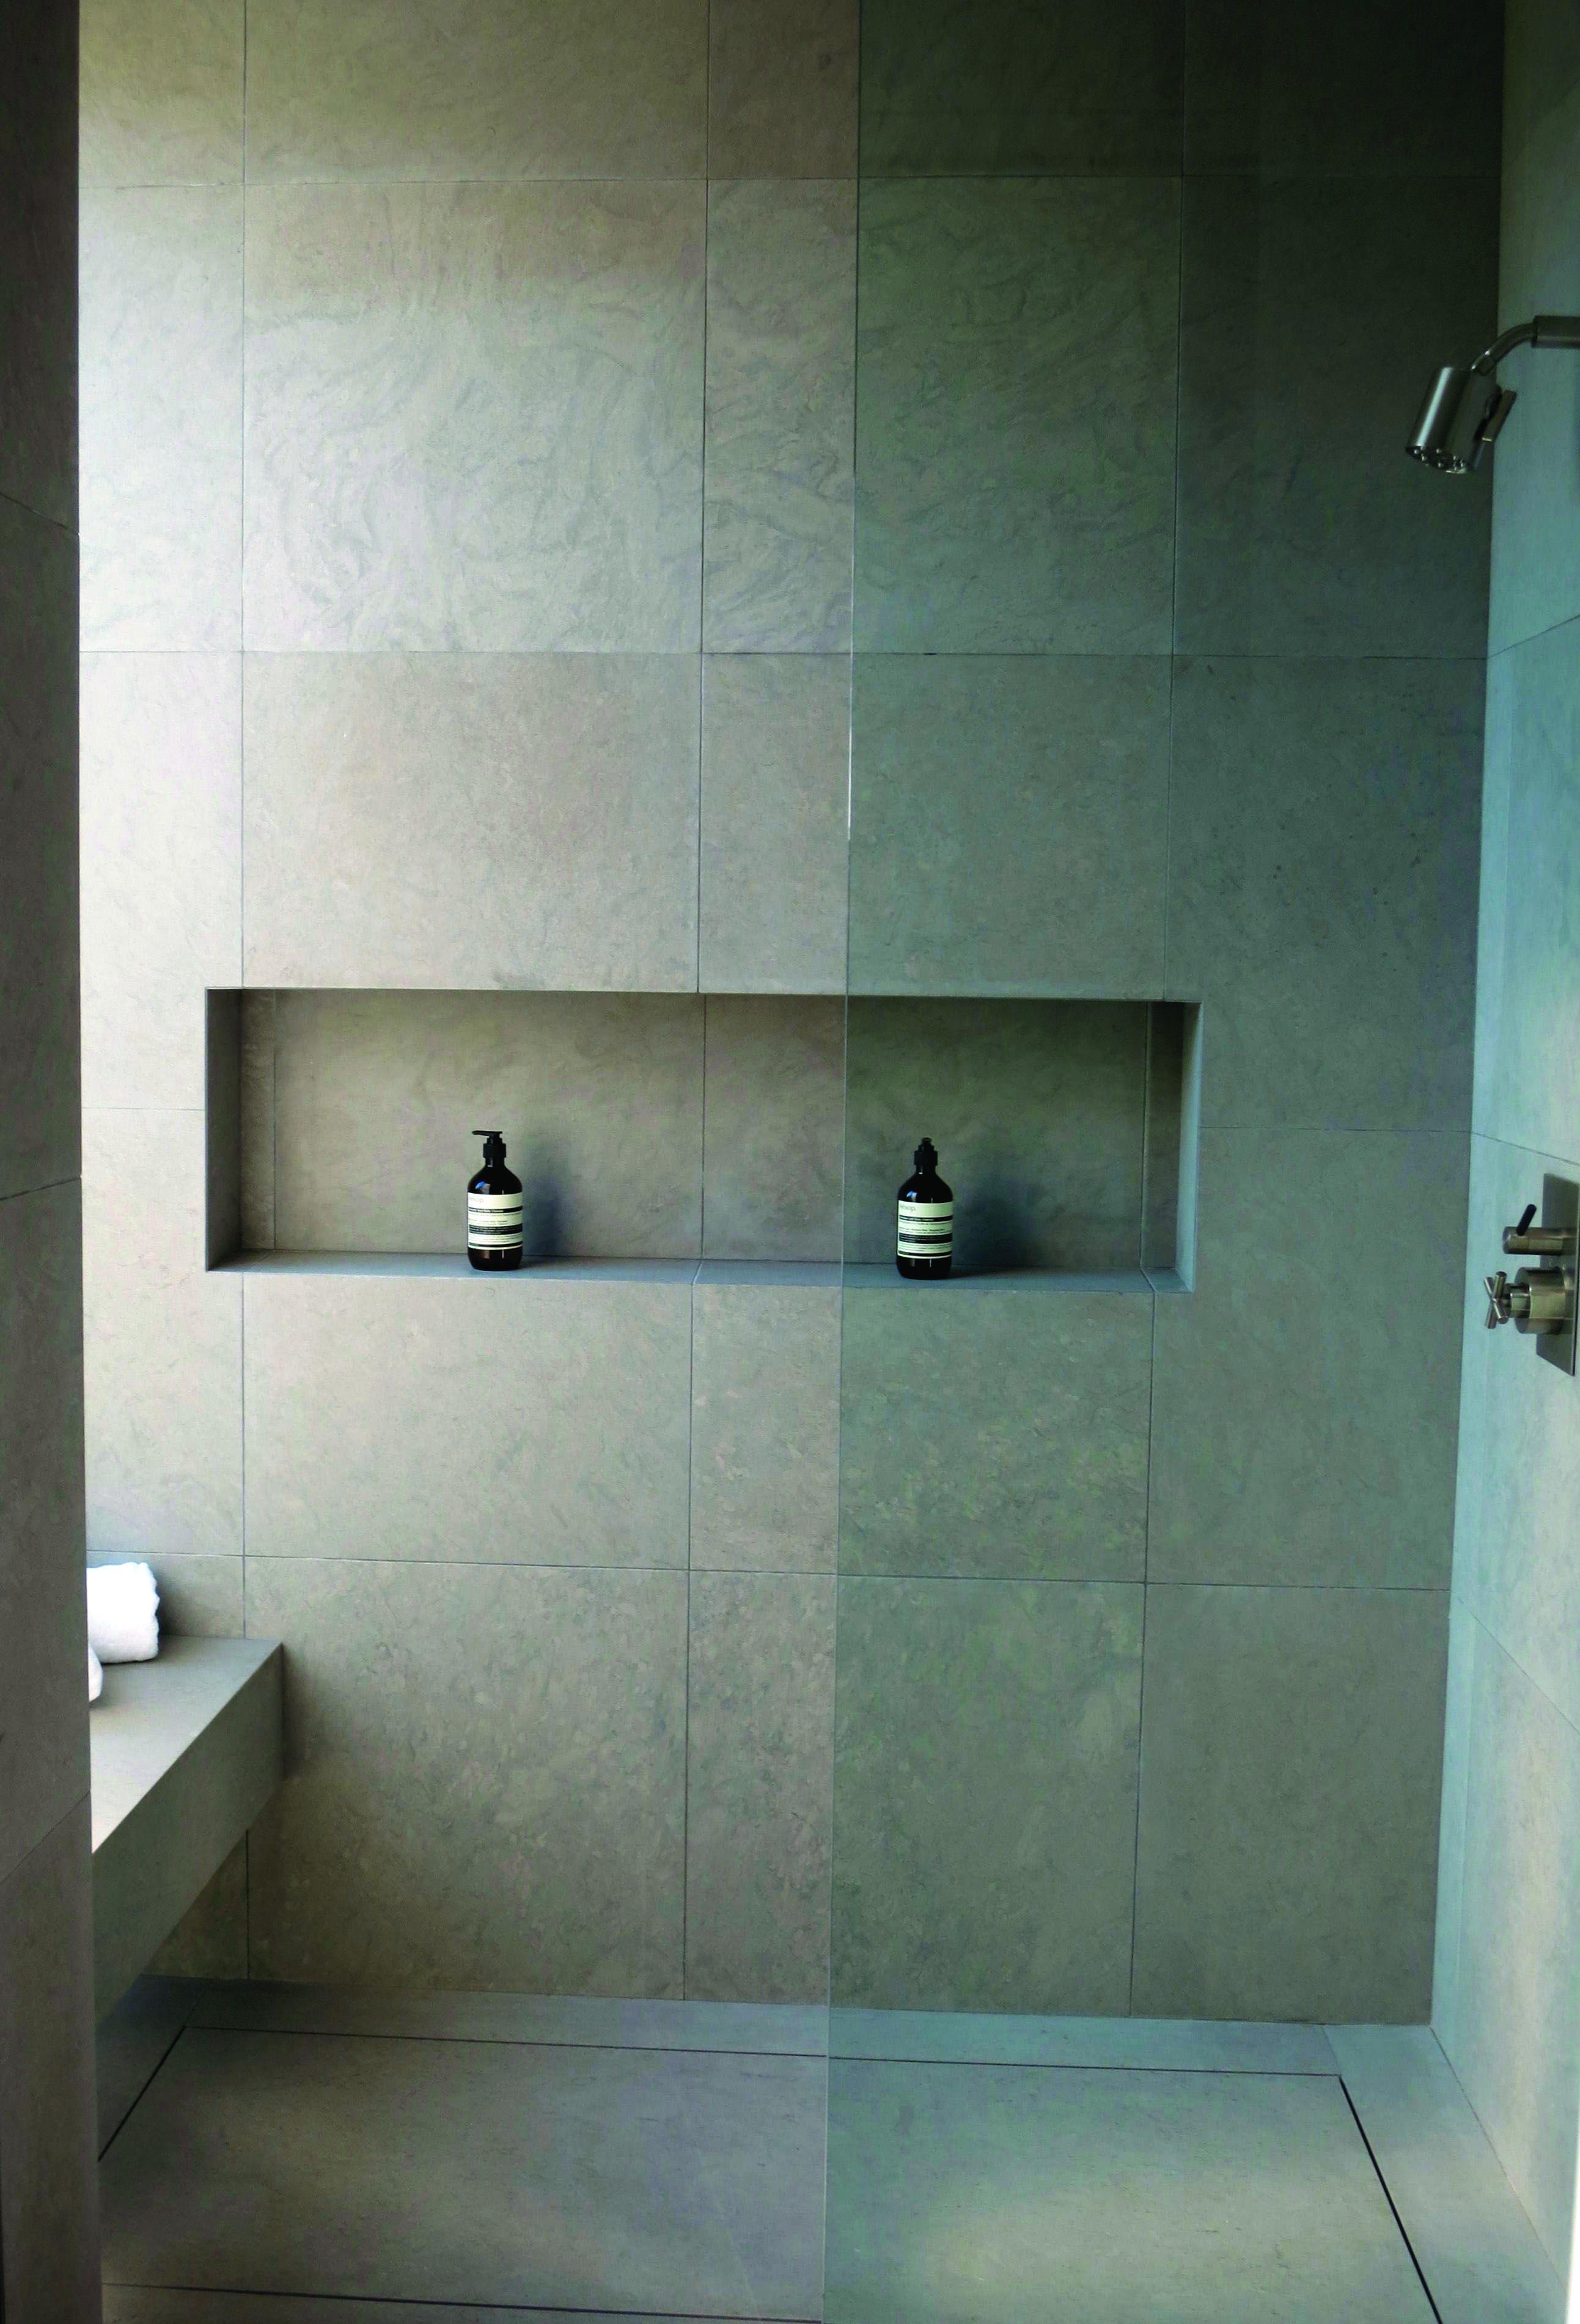 Leading Marble Shower Niche Ideas On This Favorite Site Recessed Shower Shelf Large Tile Bathroom Shower Shelves